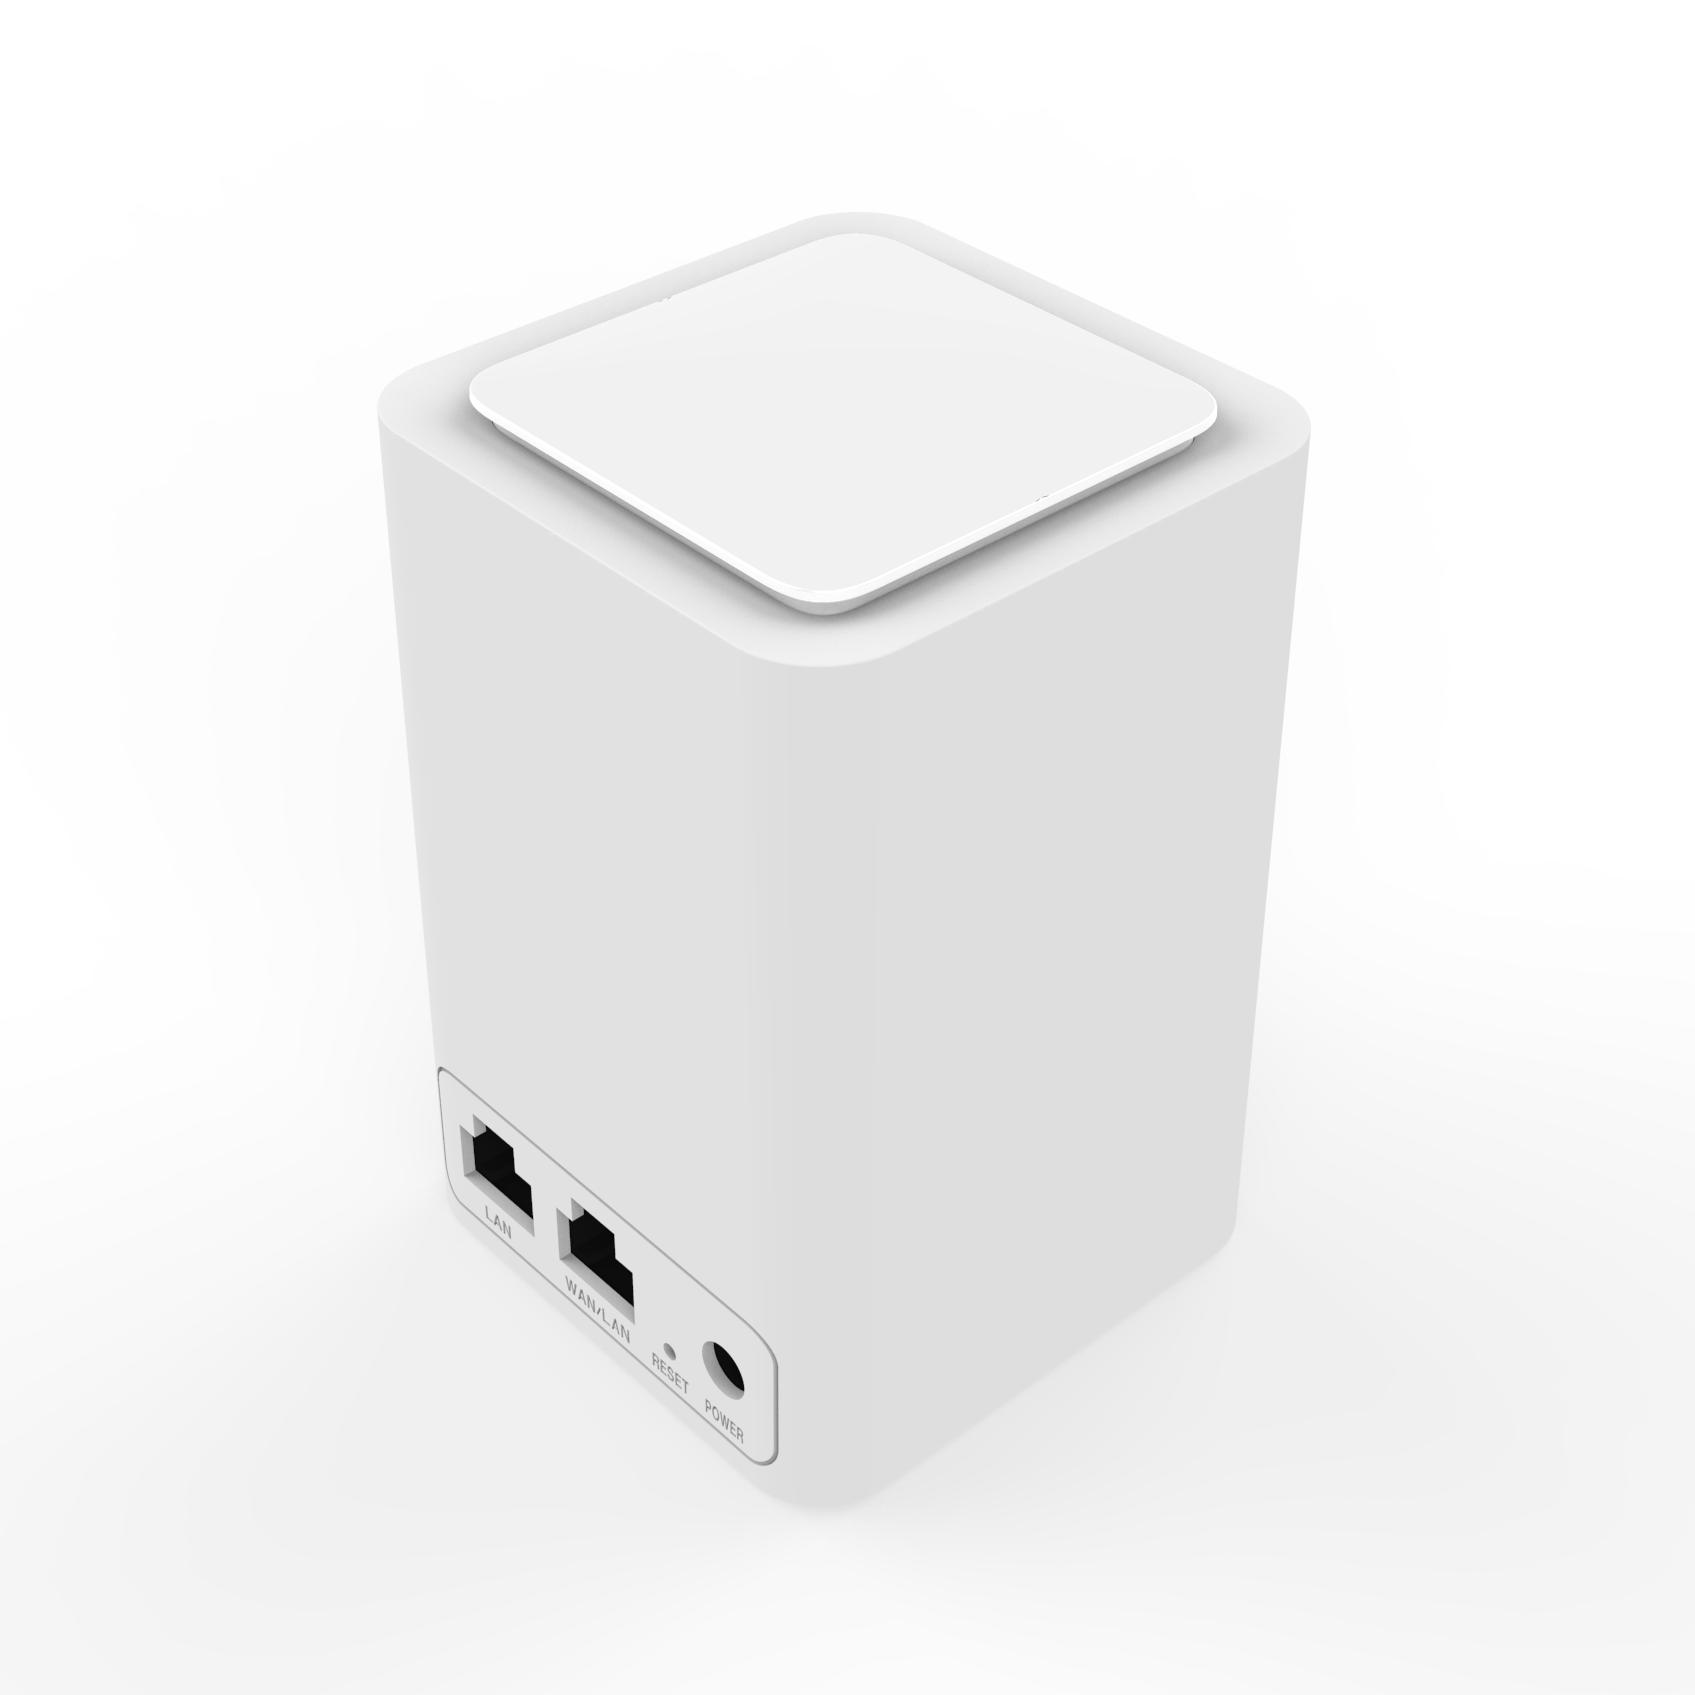 WELLNET PIX-LINK LV-WR11 300Mbps Kablosuz-N Tekrarlayıcı / Yönlendirici / AP resmi